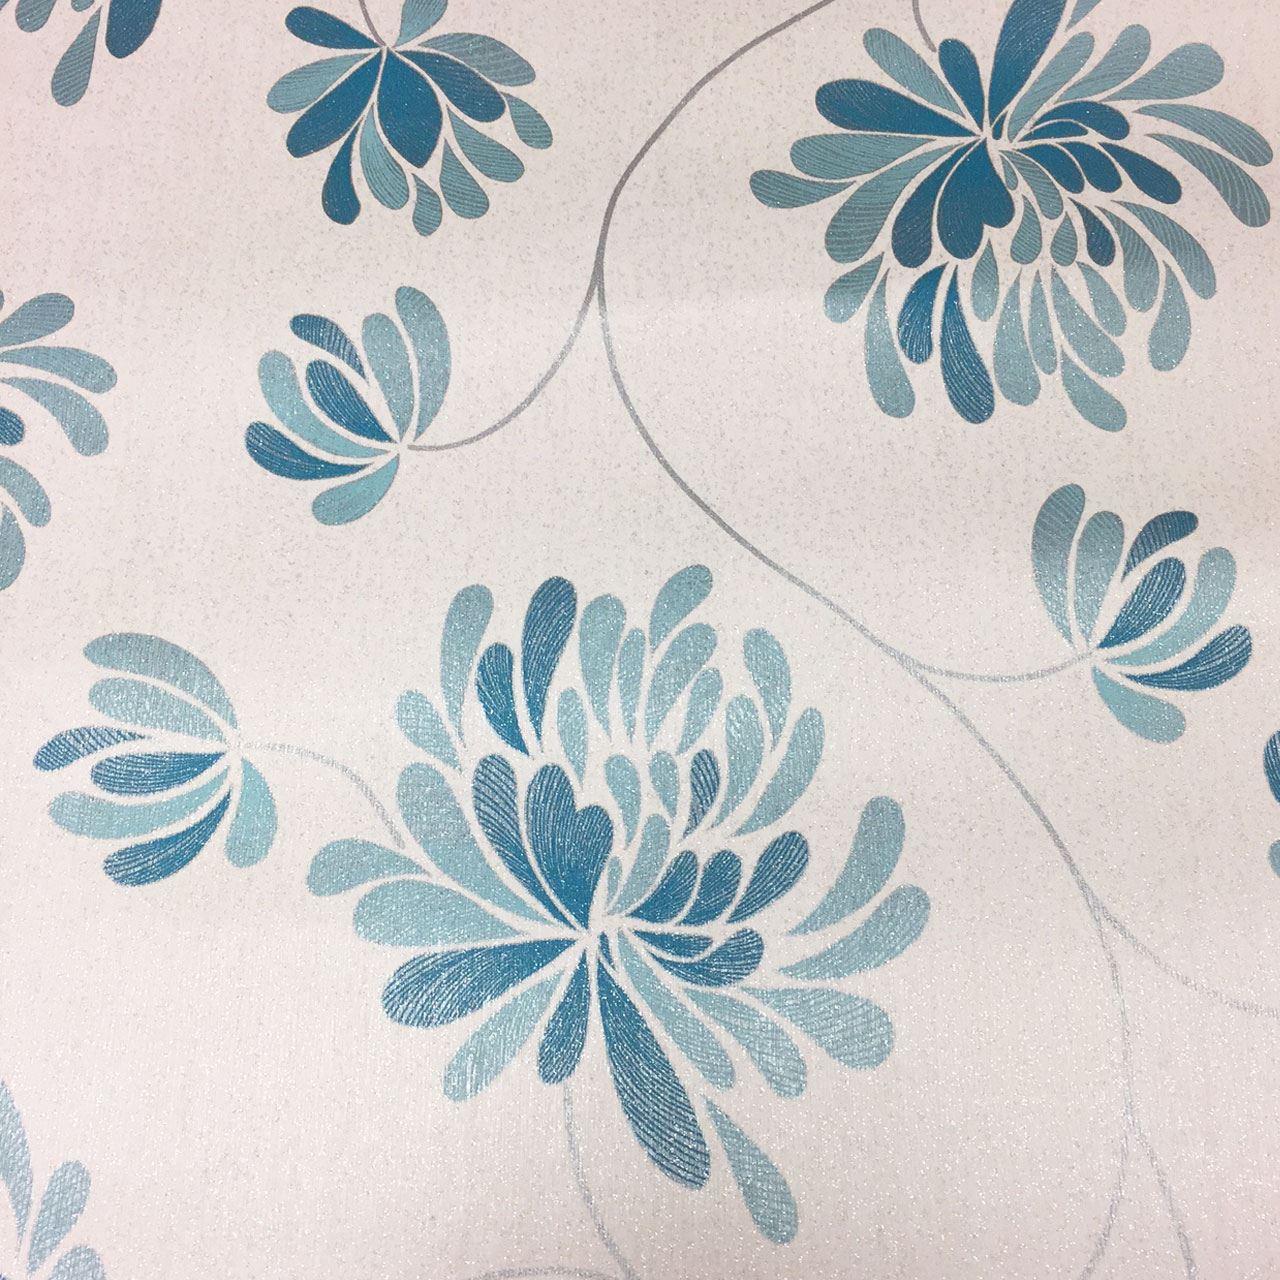 Aqua Teal Blue Silver Flower Floral Wallpaper Glitter